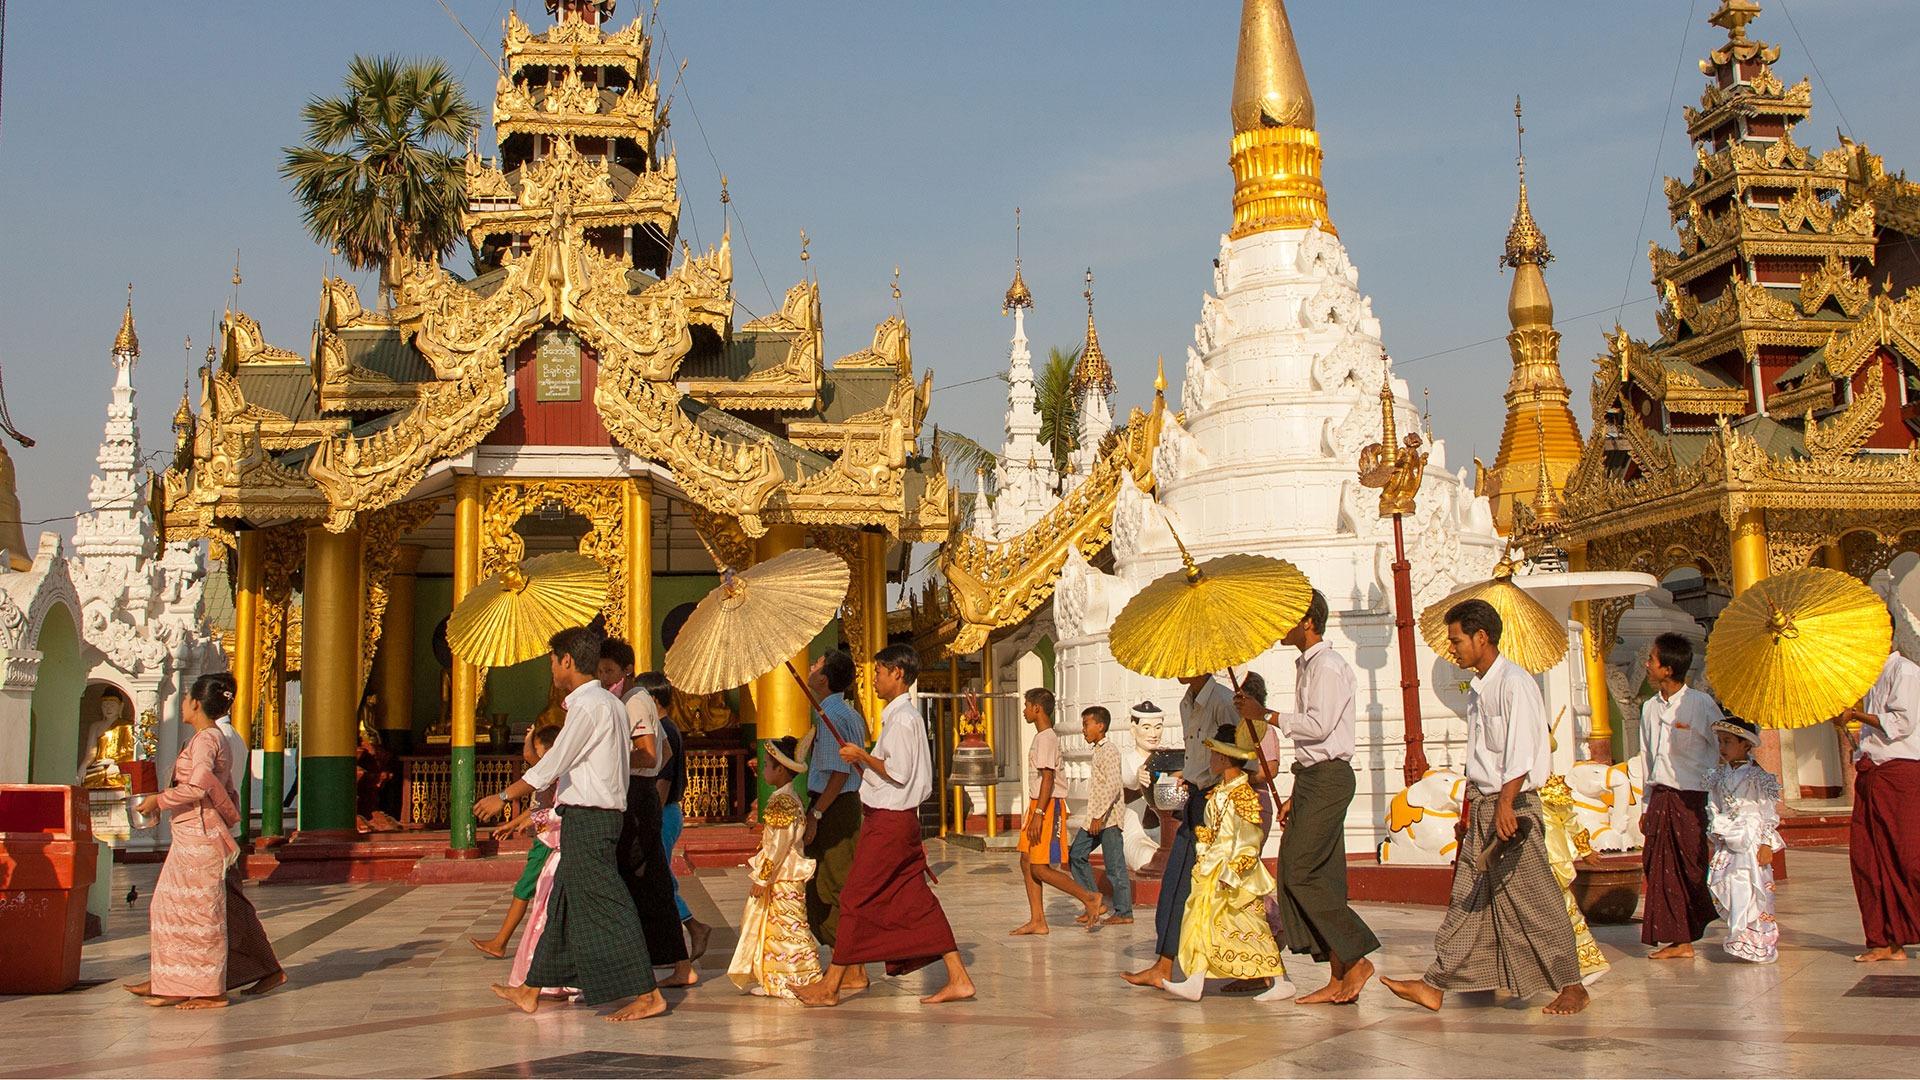 Procession near Shwedagon Pagoda in Yangon, Myanmar